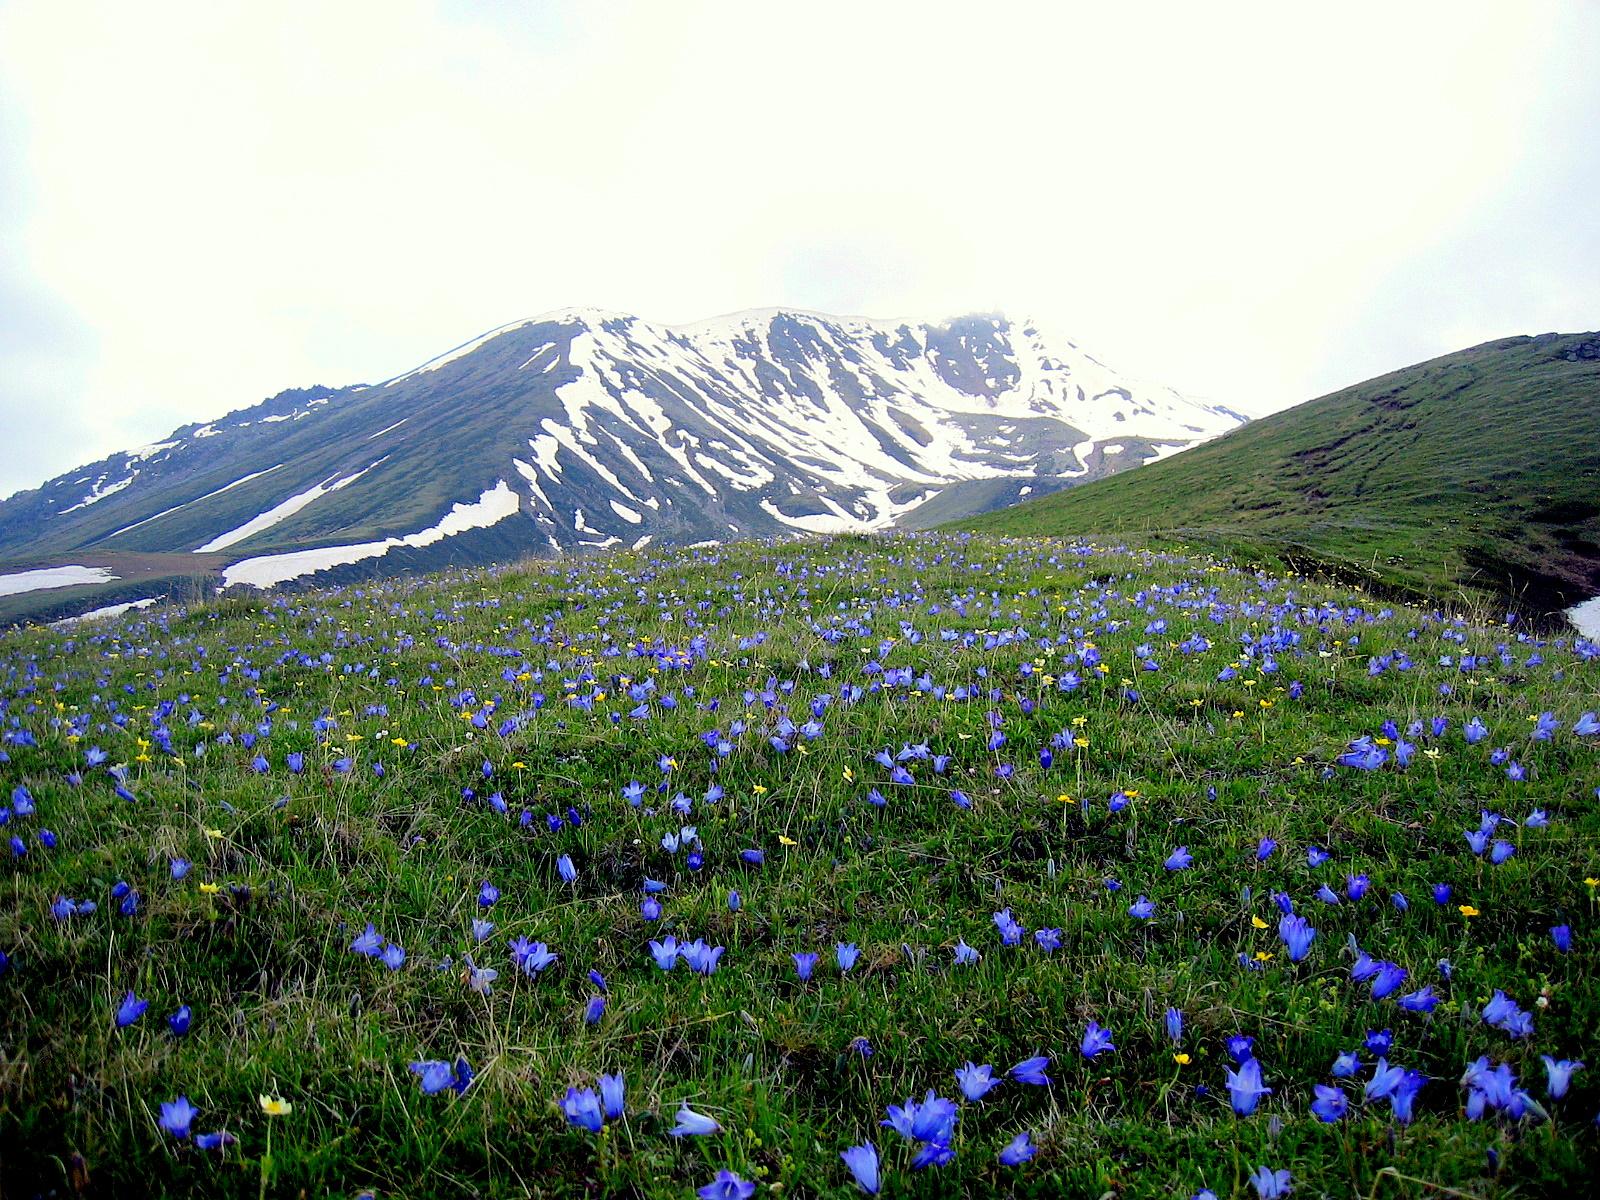 File:View climbing up to Gergeti Glacier, flowers.JPG - Wikimedia ...